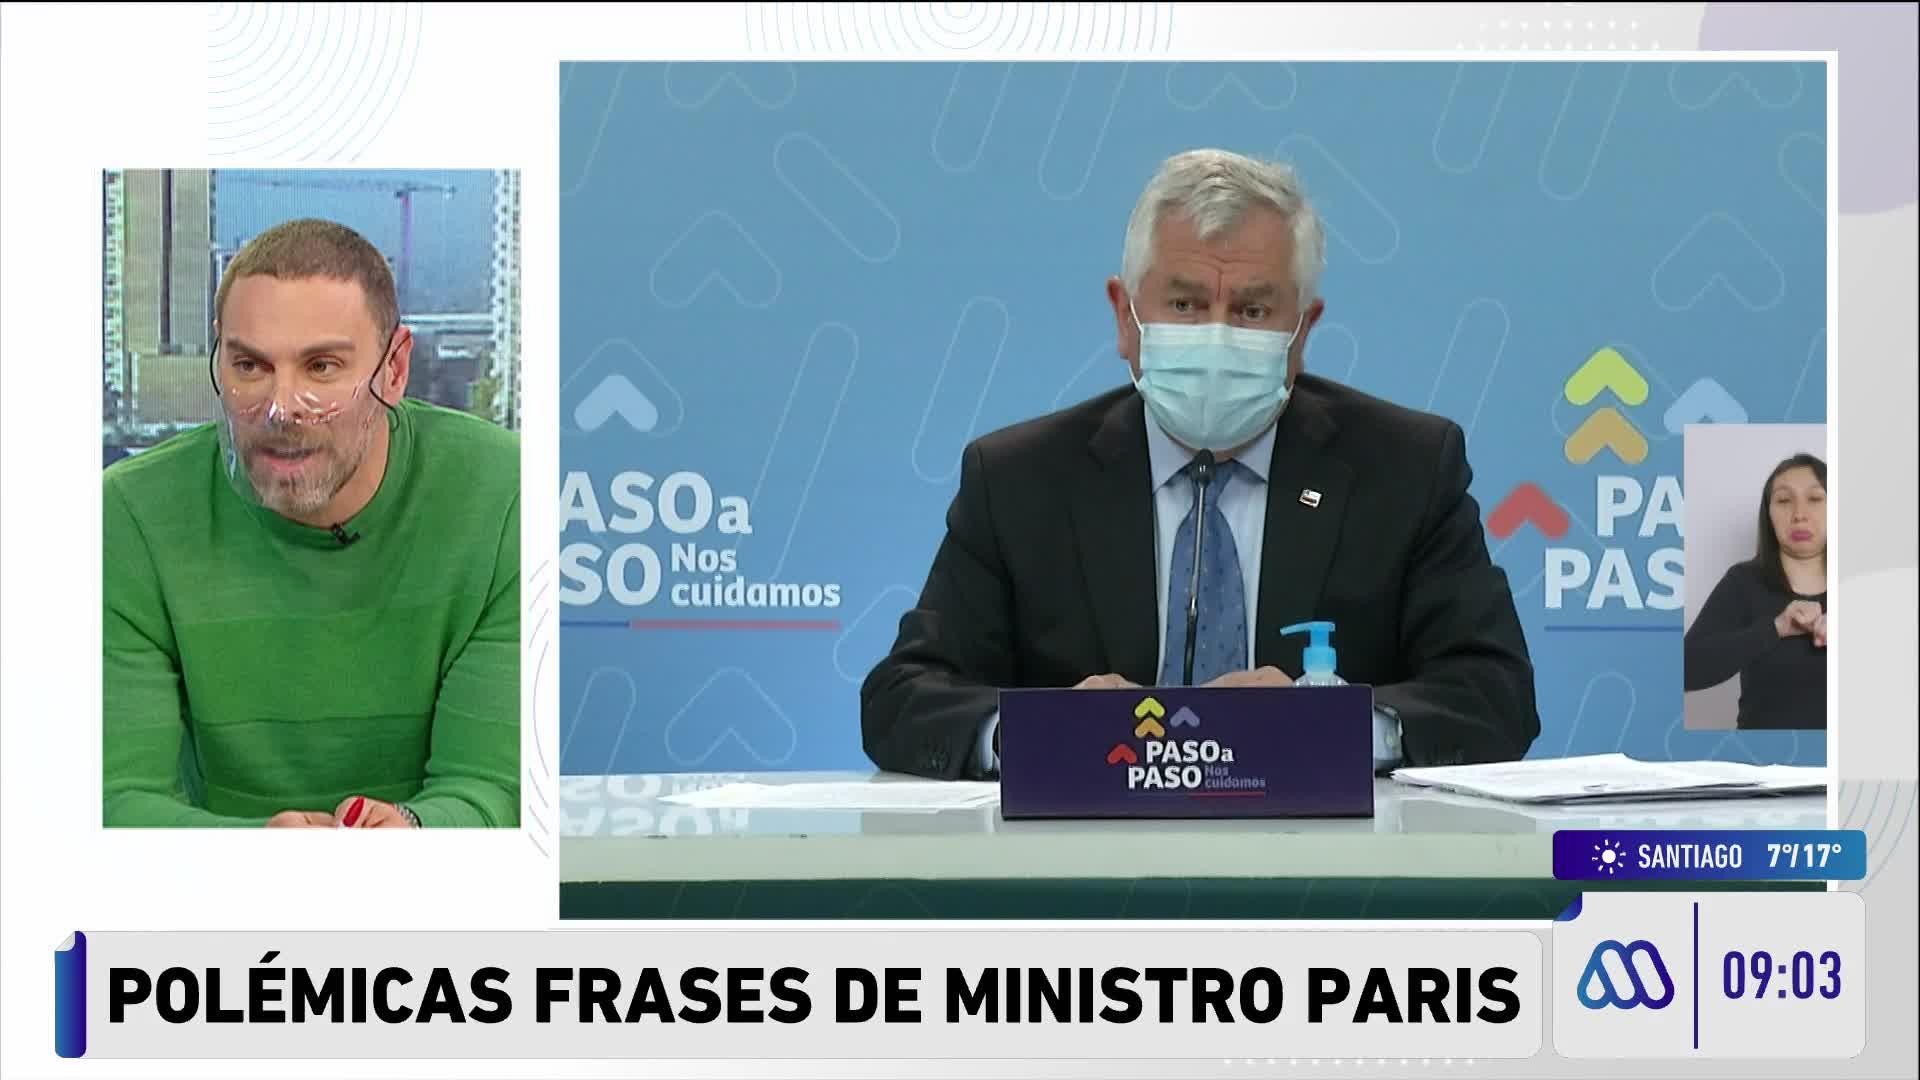 Neme hablándole al ministro Paris en